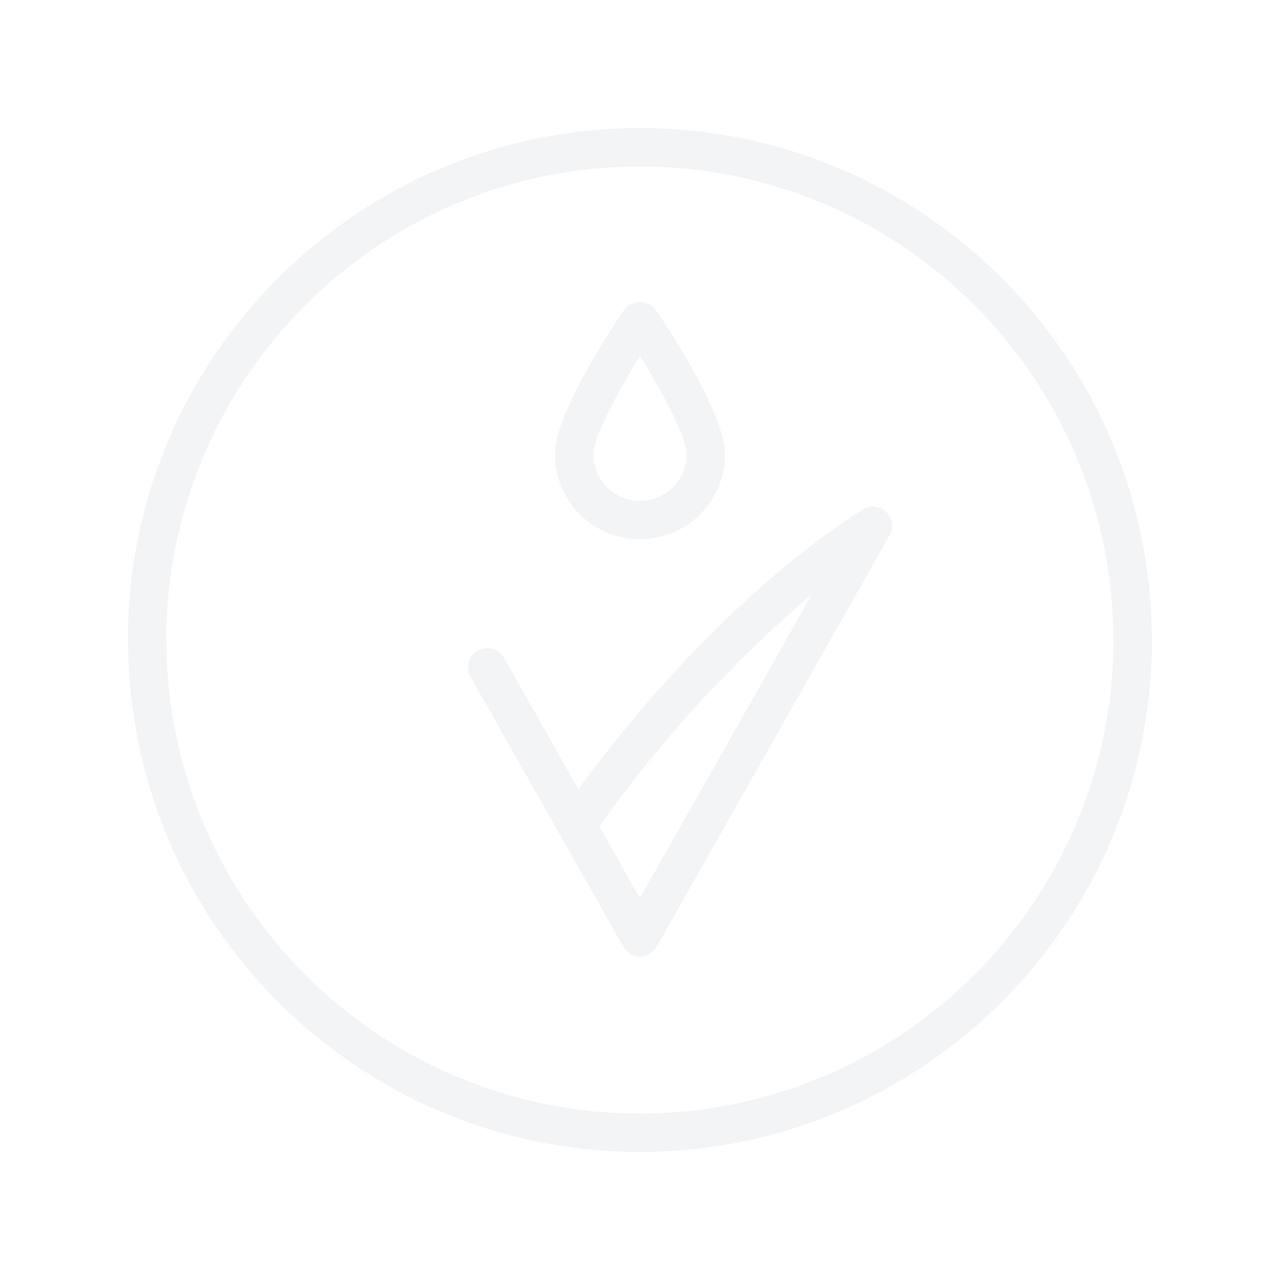 EVERYDAY MINERALS Shimmer Blush 4.8g